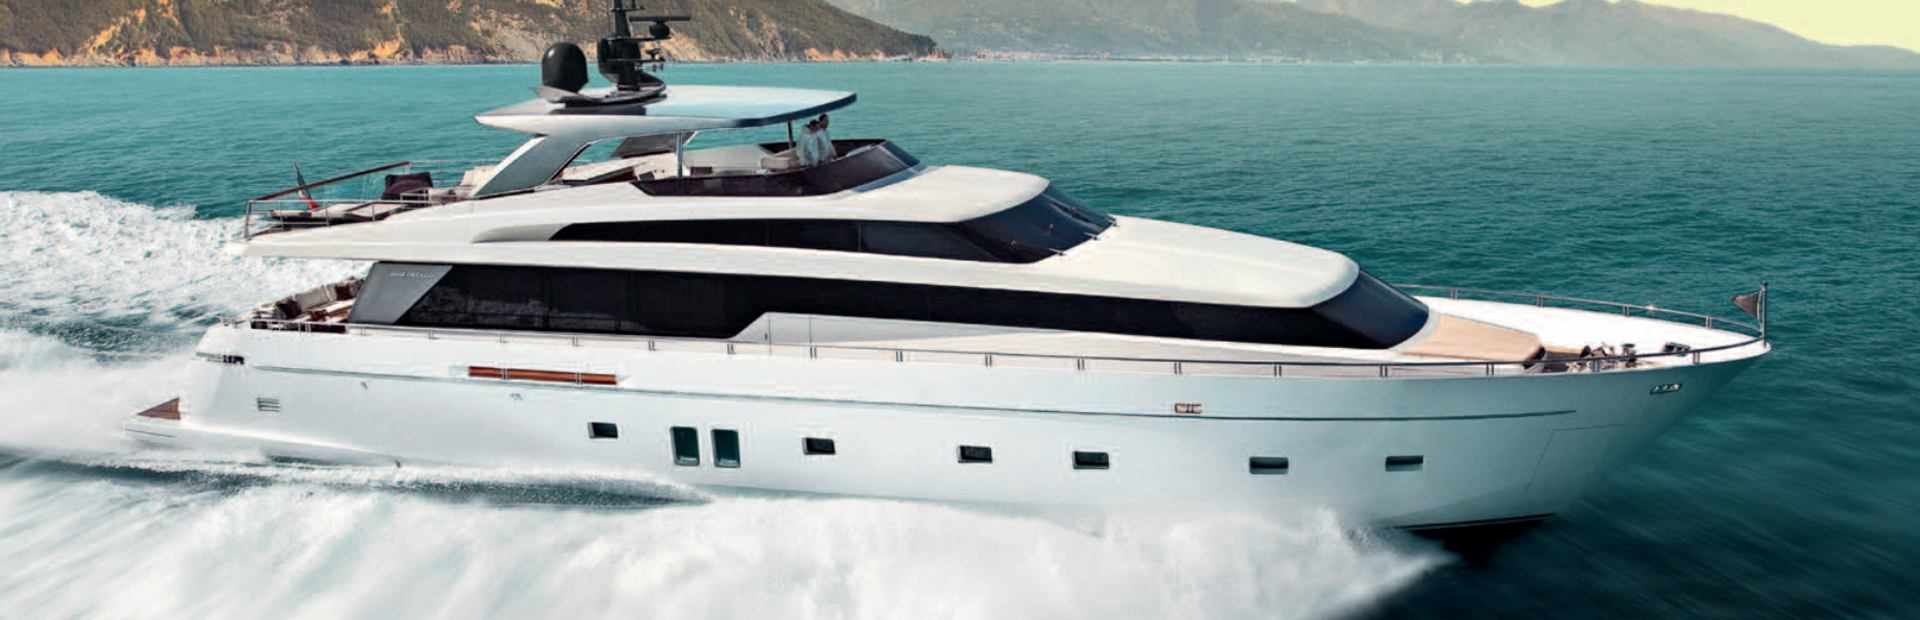 SL104 Yacht Charter